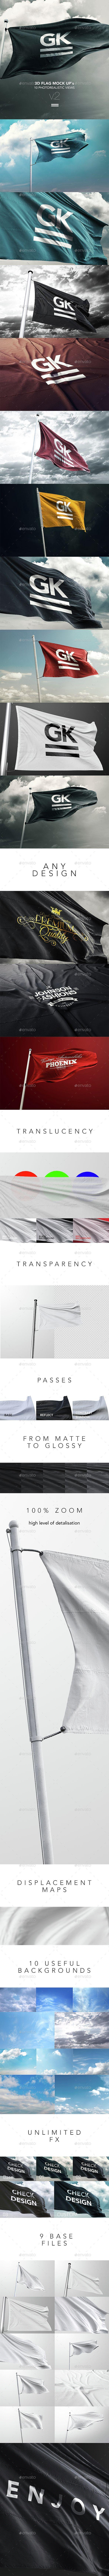 10 Realistic 3D Flag Mock-Up V2.0. Download here: http://graphicriver.net/item/10-realistic-3d-flag-mockup/14602197?ref=ksioks